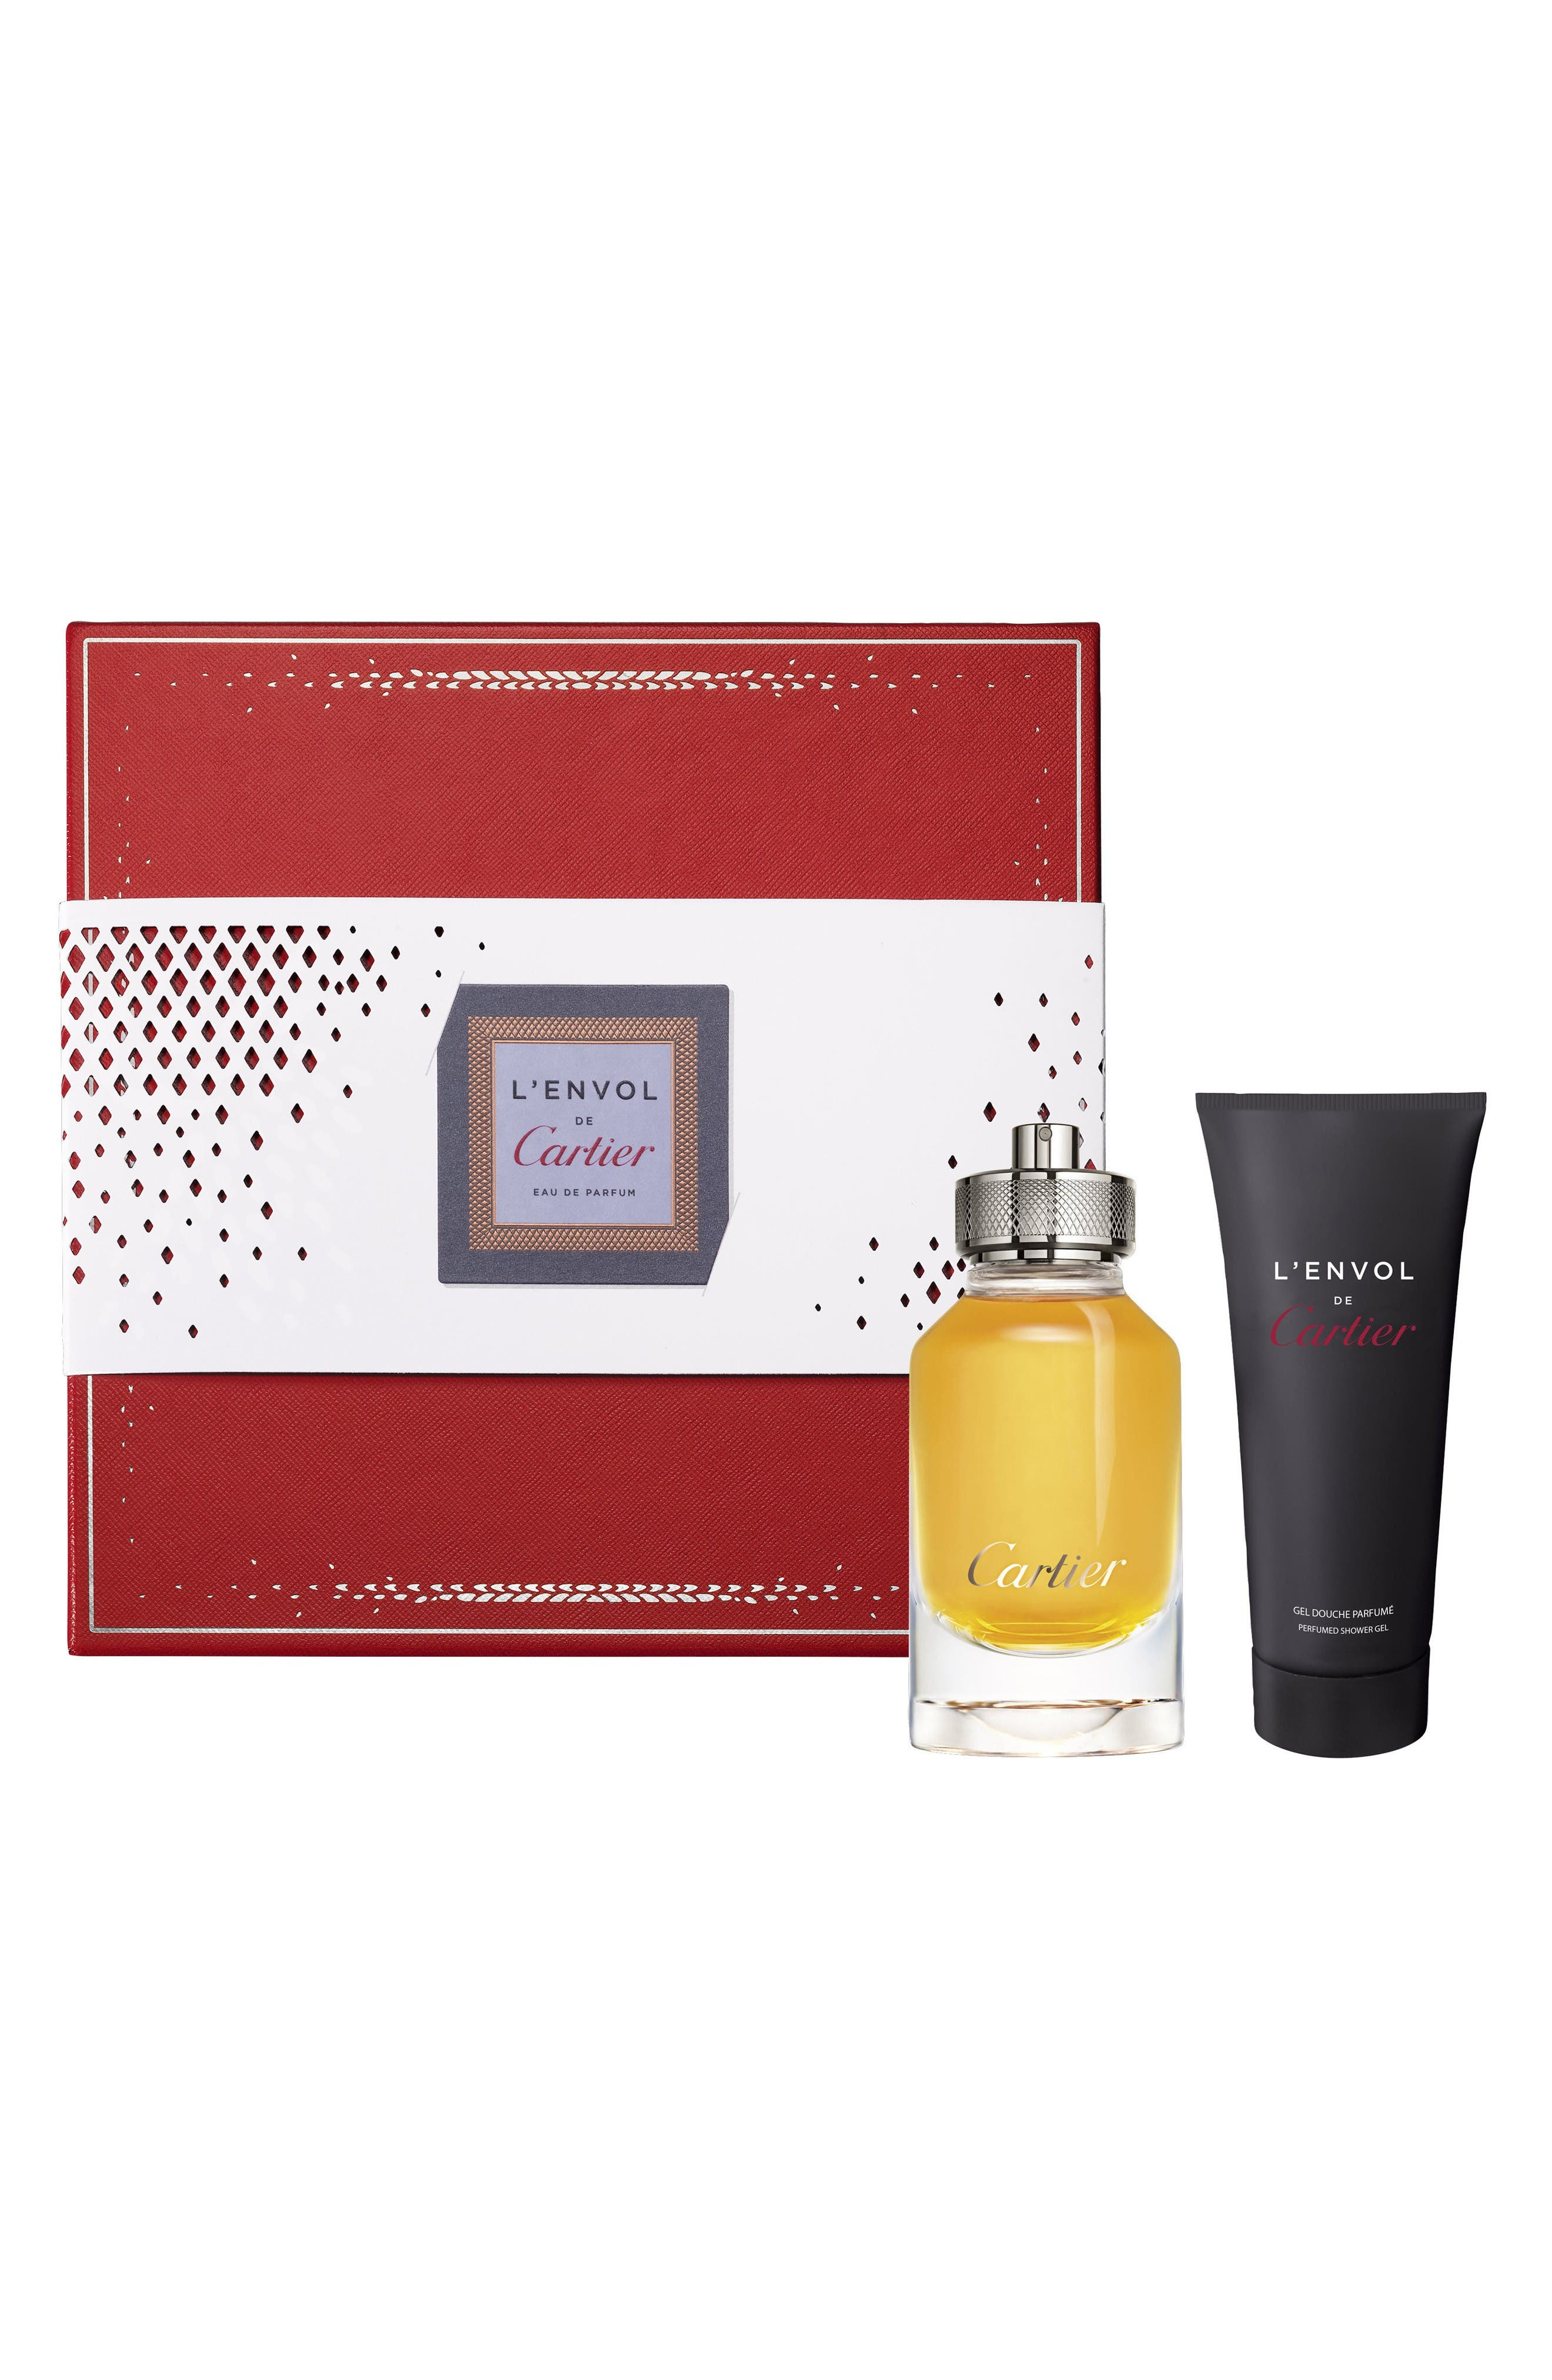 Cartier L'Envol de Cartier Eau de Parfum Set